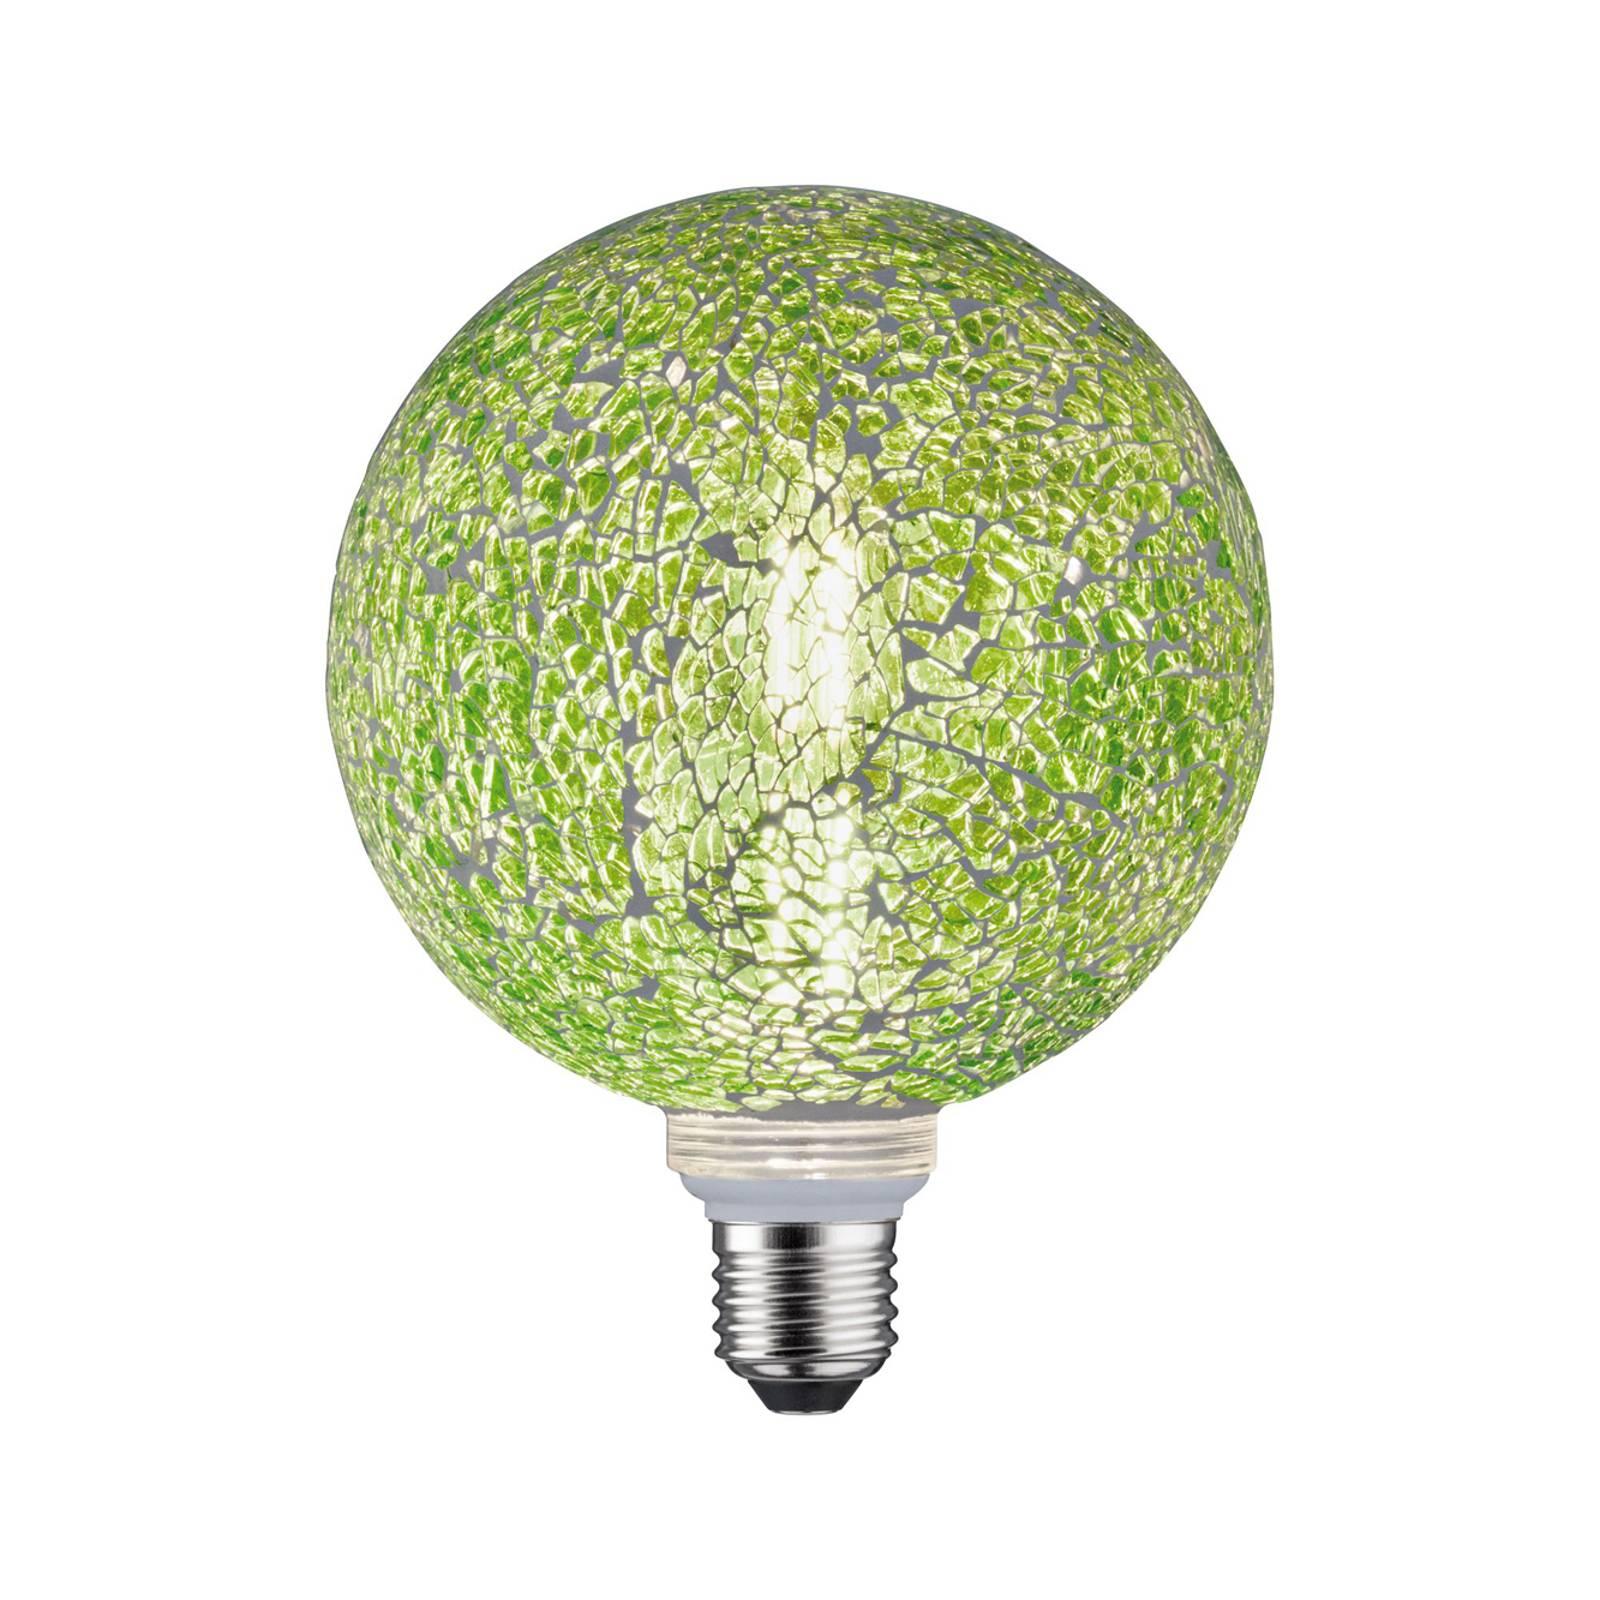 Paulmann E27 LED-Globe 5W Miracle Mosaic vihreä